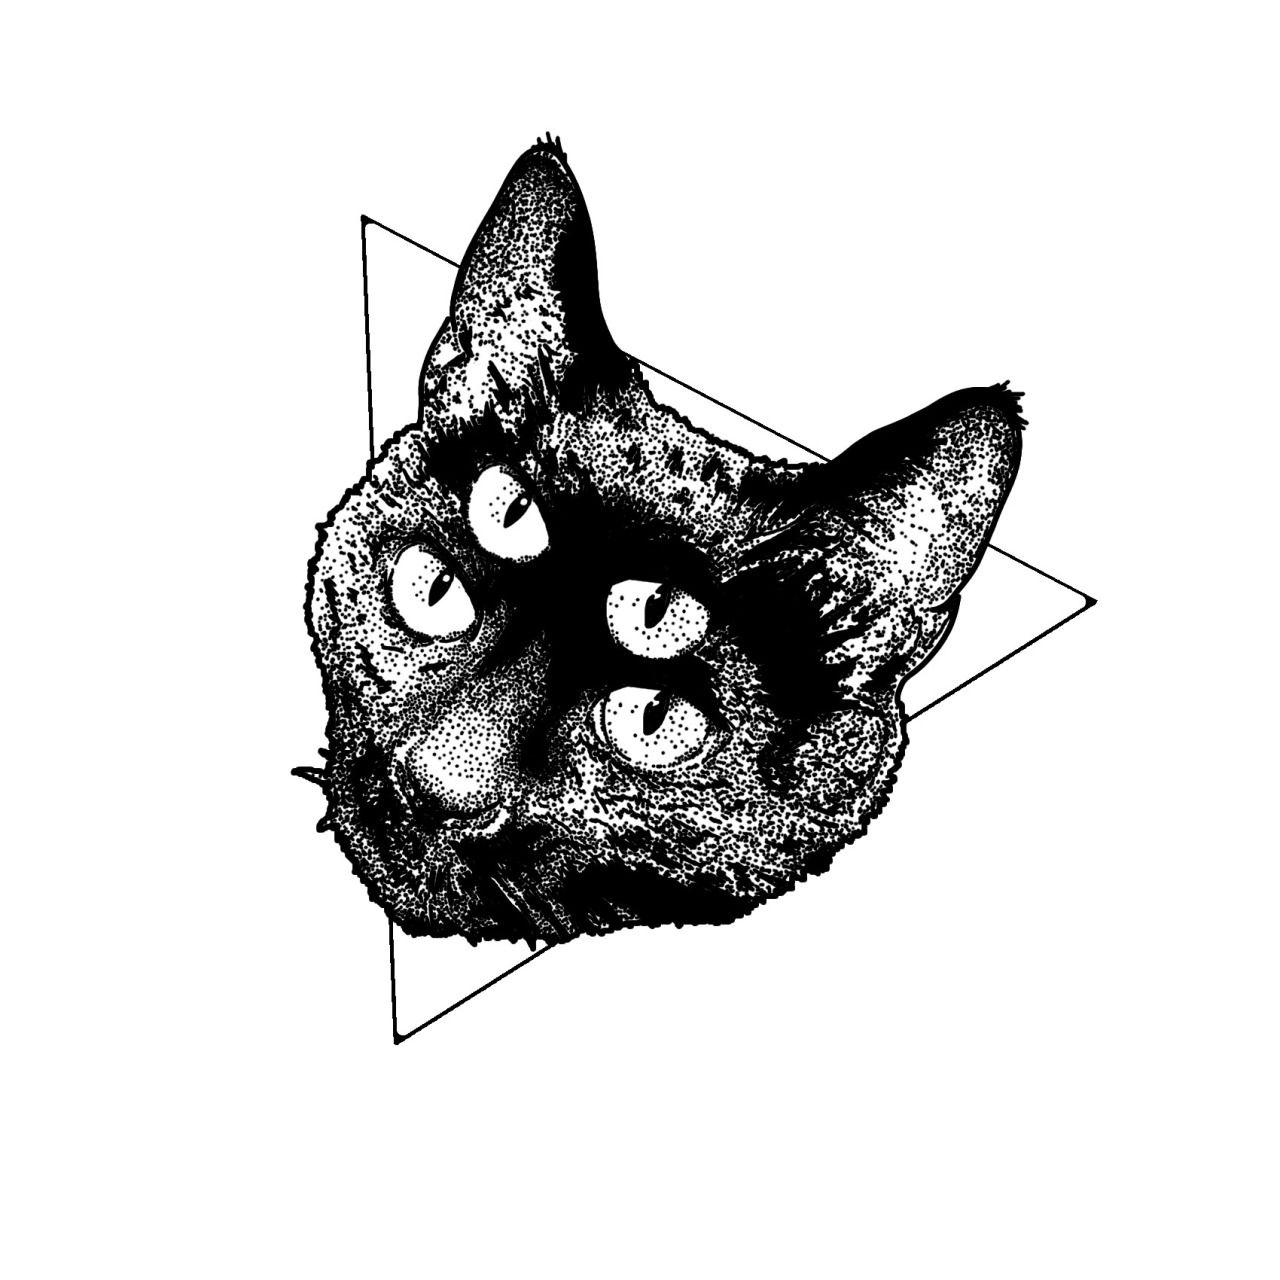 Stanley Duke Tattoo Design Tattoos Illustration Dotwork Linework Blackwork Stippling Black Cat With Images Vintage Drawing Tattoo Illustration Cat Tattoo